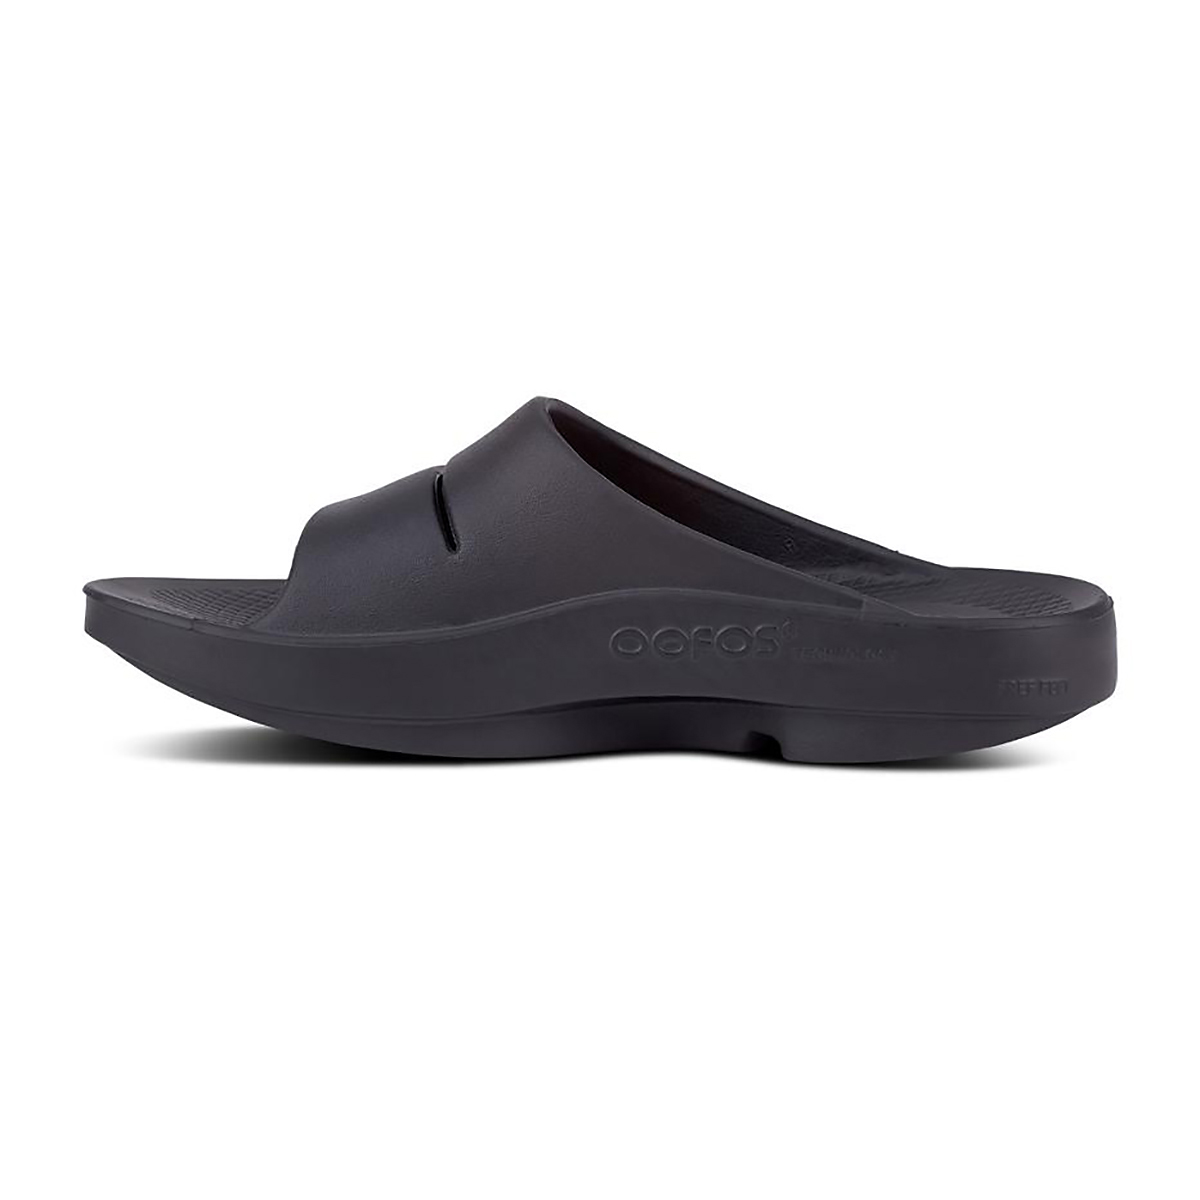 Oofos Ooahh Slide Recovery Sandal - Color: Black - Size: M7/W9 - Width: Regular, Black, large, image 2